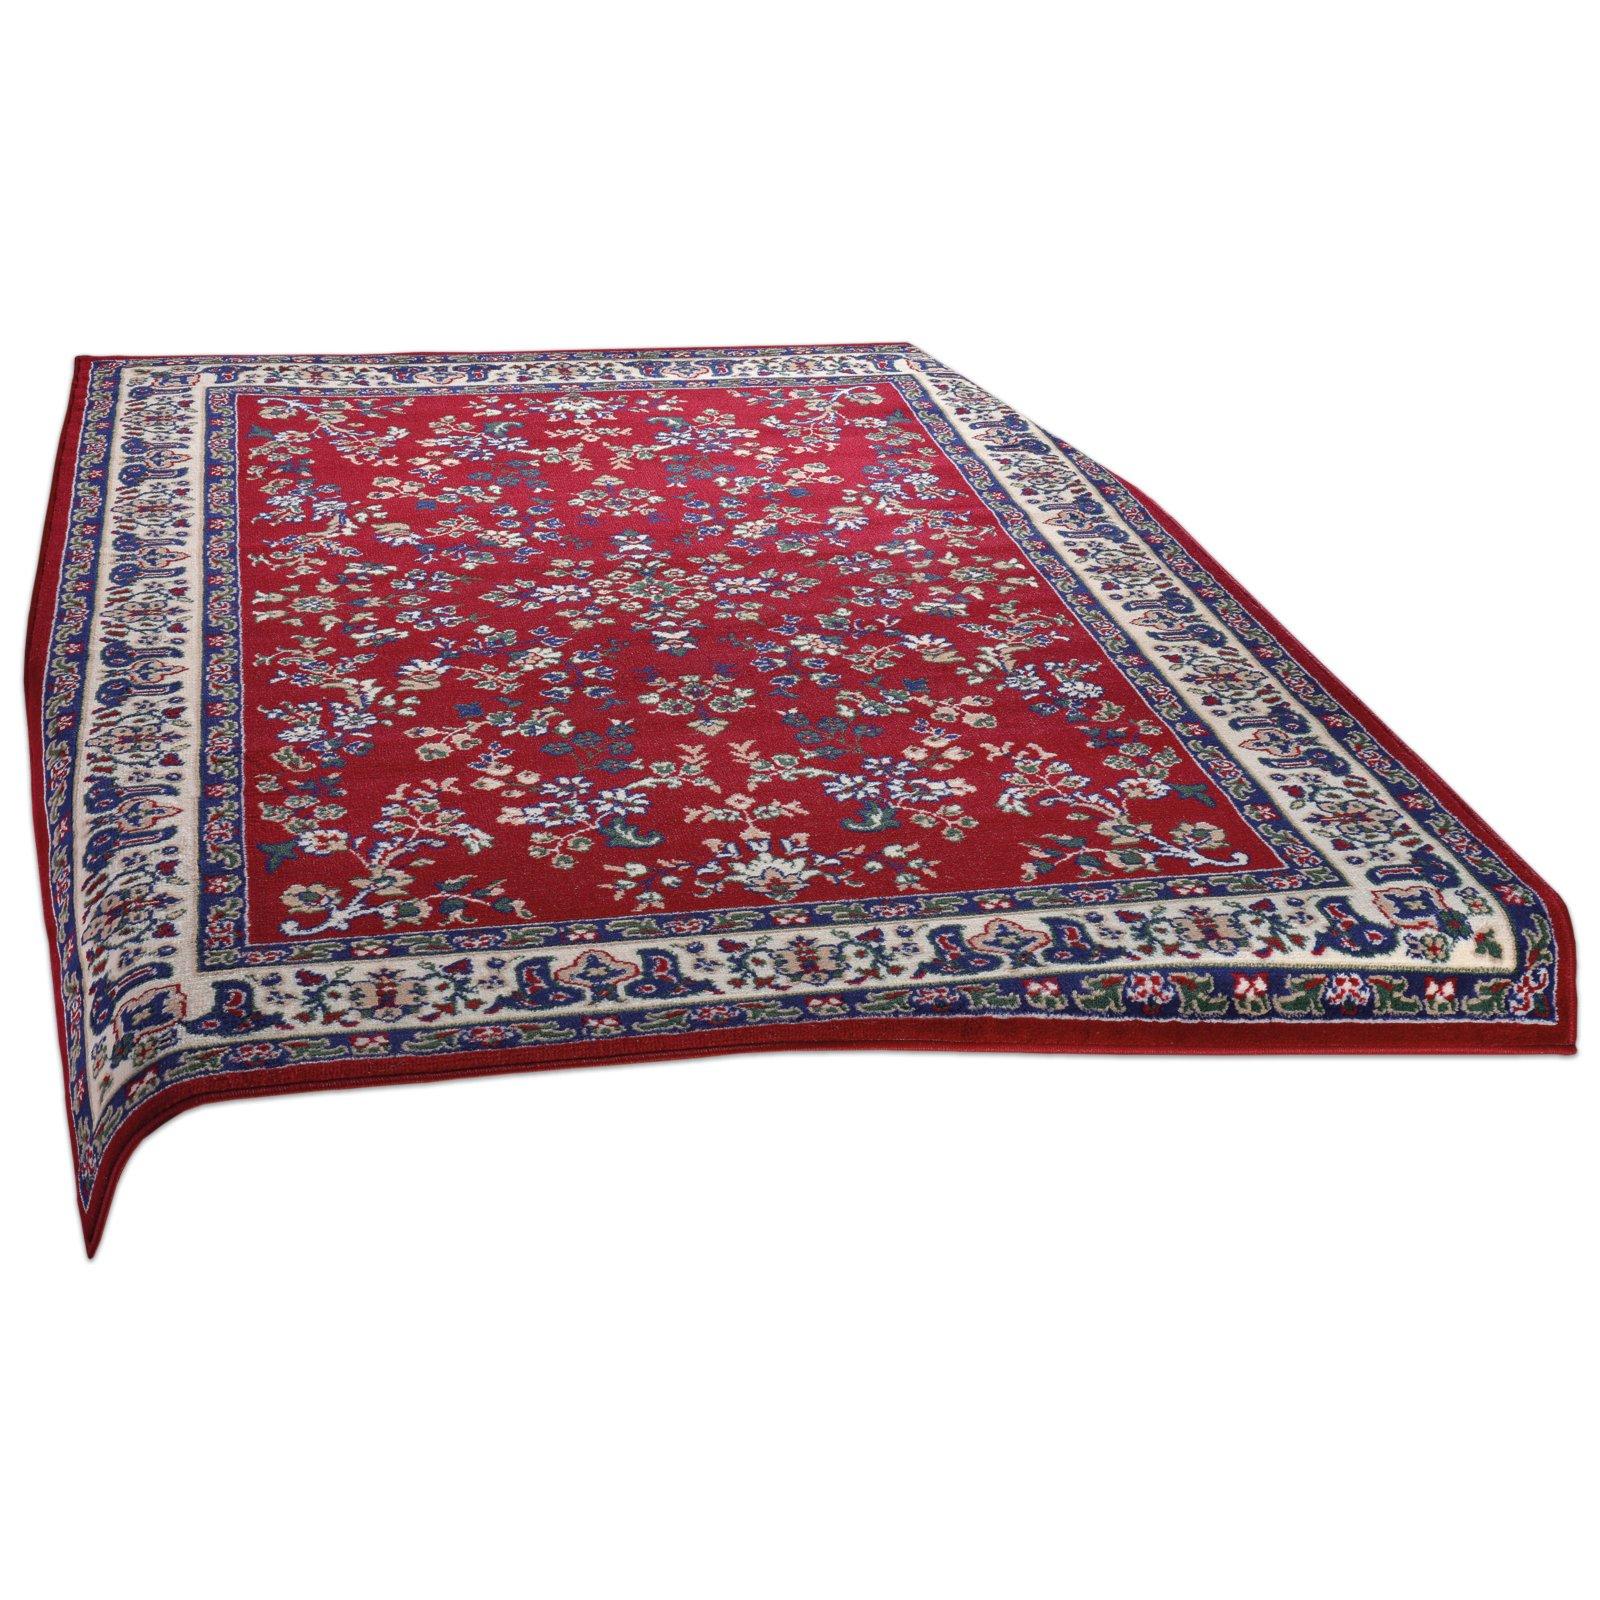 teppich orient rot 60x110 cm orient teppiche. Black Bedroom Furniture Sets. Home Design Ideas